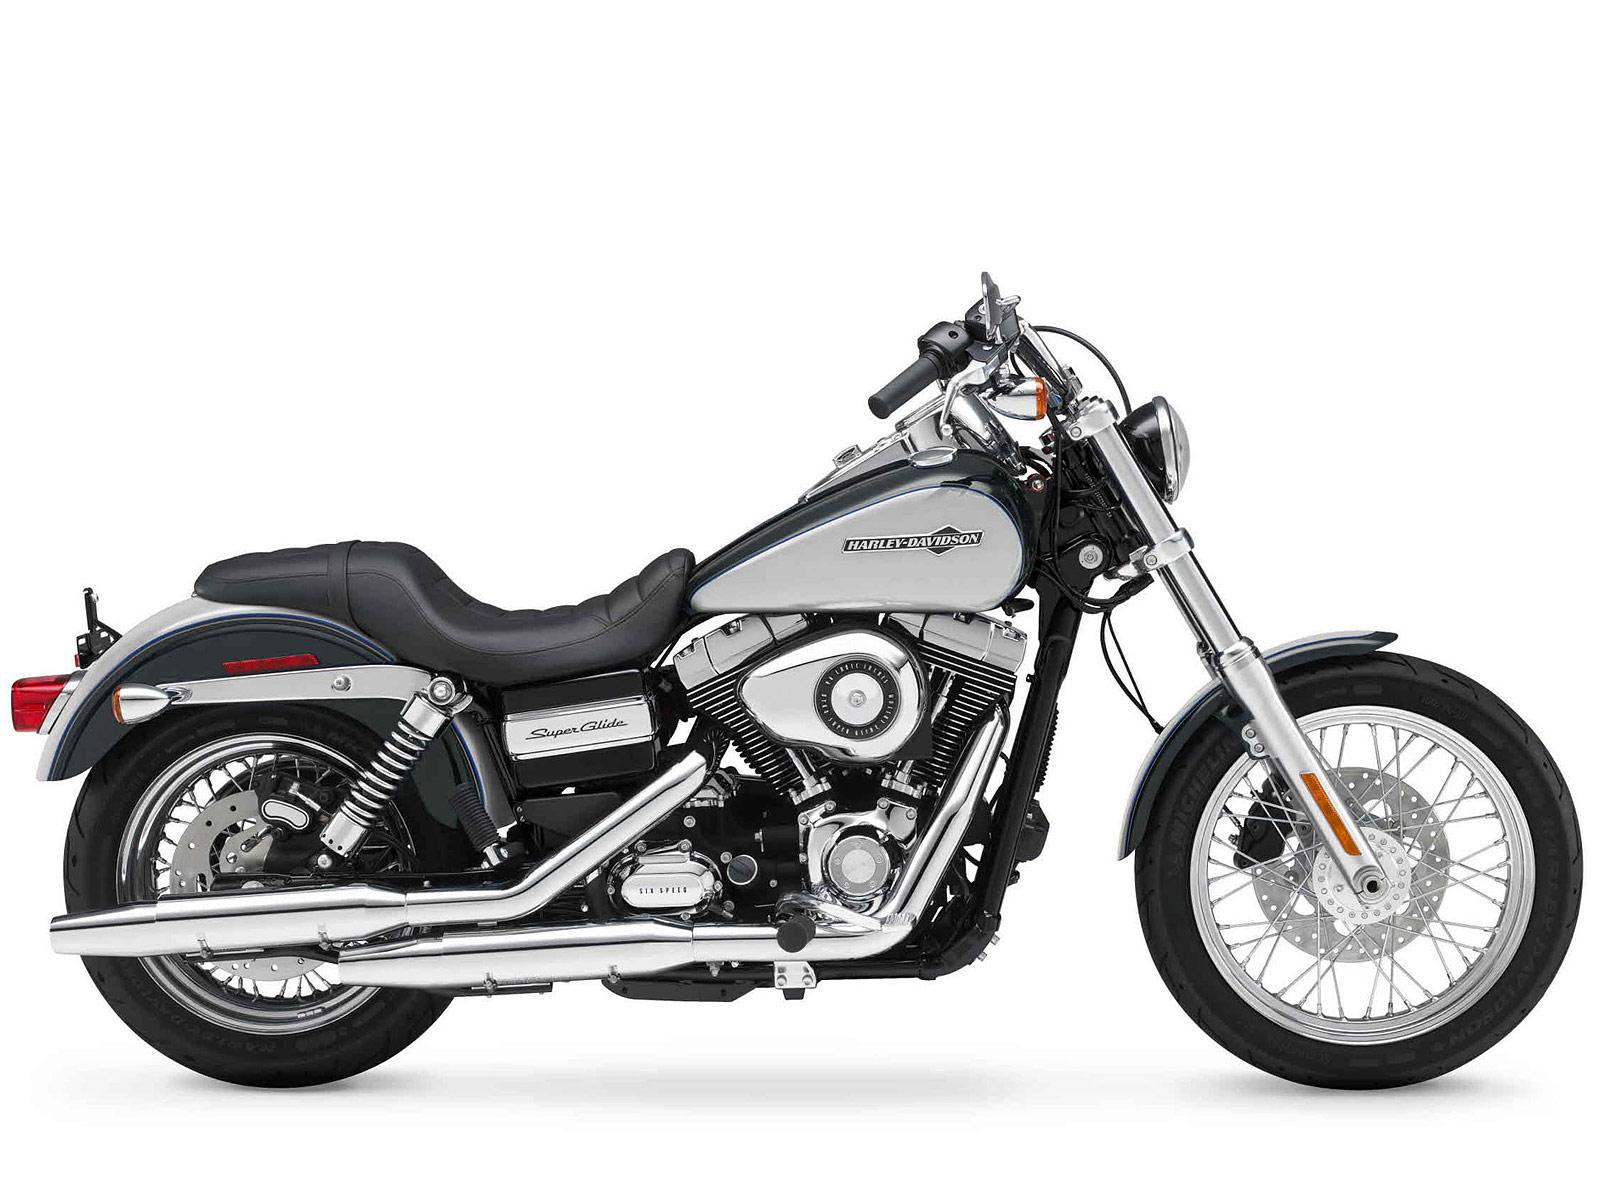 Harley Davidson: 2012 Harley-Davidson FXDC Dyna Super Glide Custom